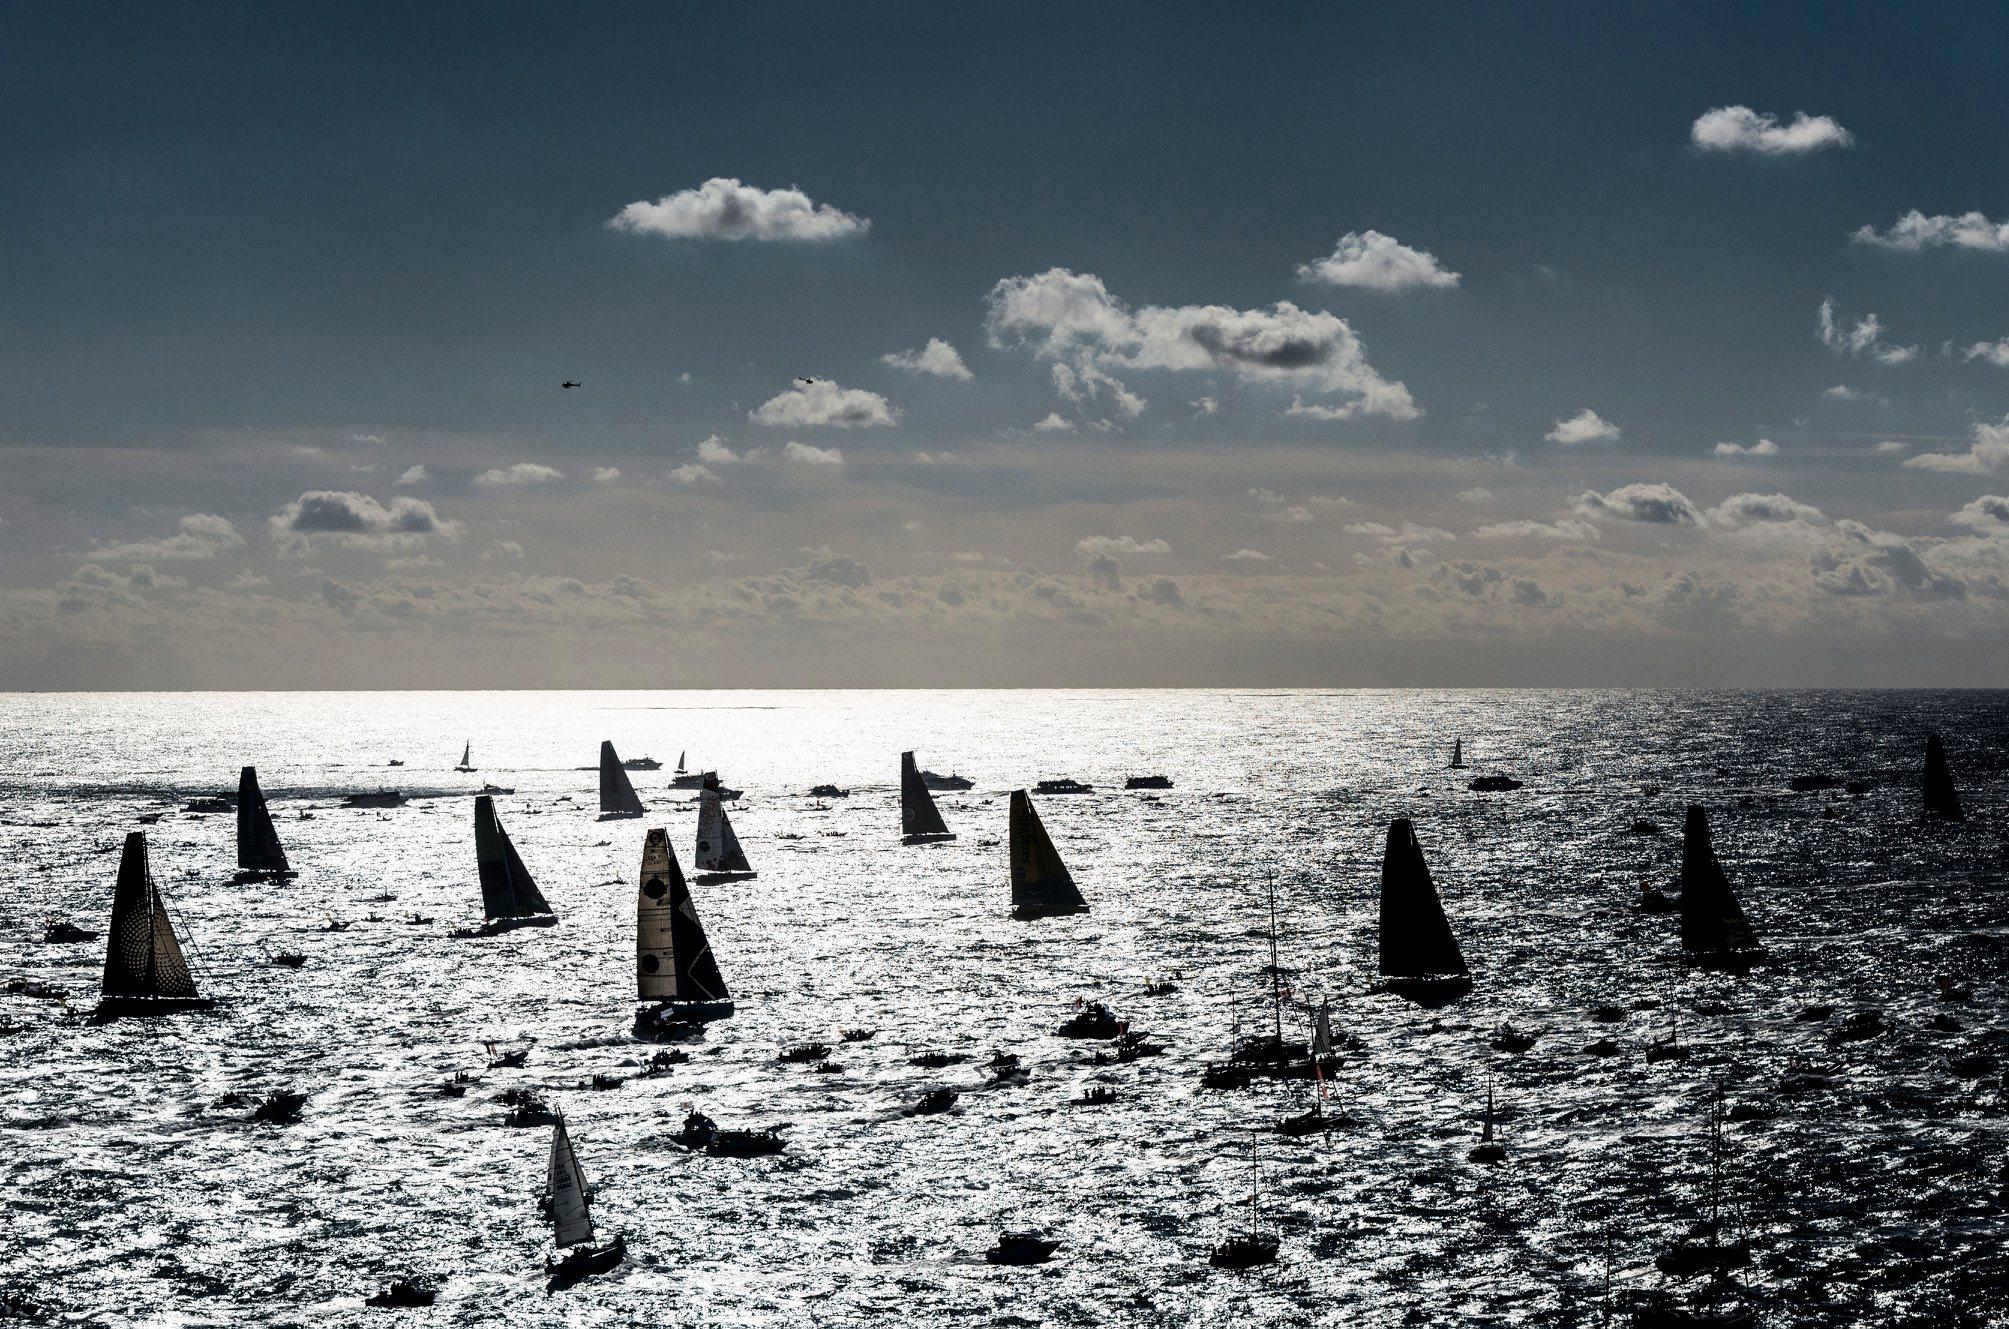 Ulysse Nardin Diver x Cape Horn- cape horn